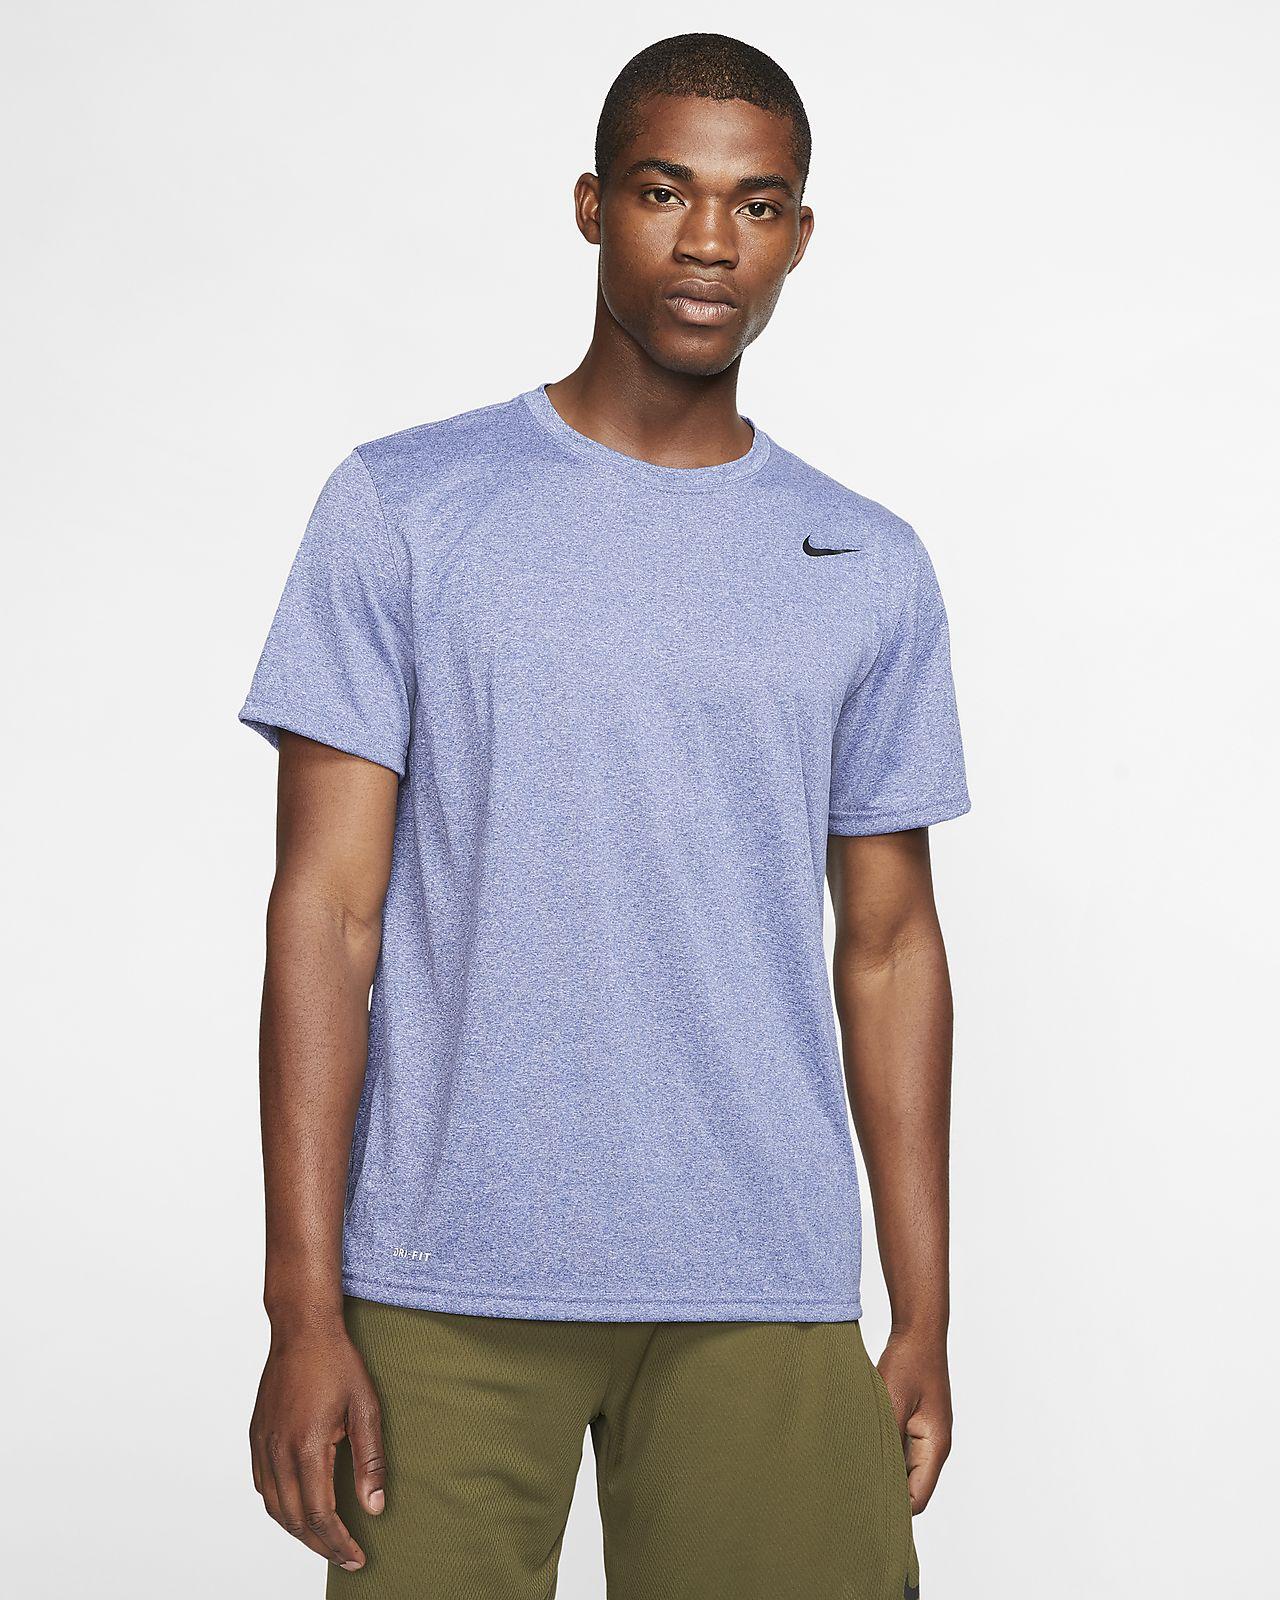 Nike Legend 2.0 Men's Training T Shirt